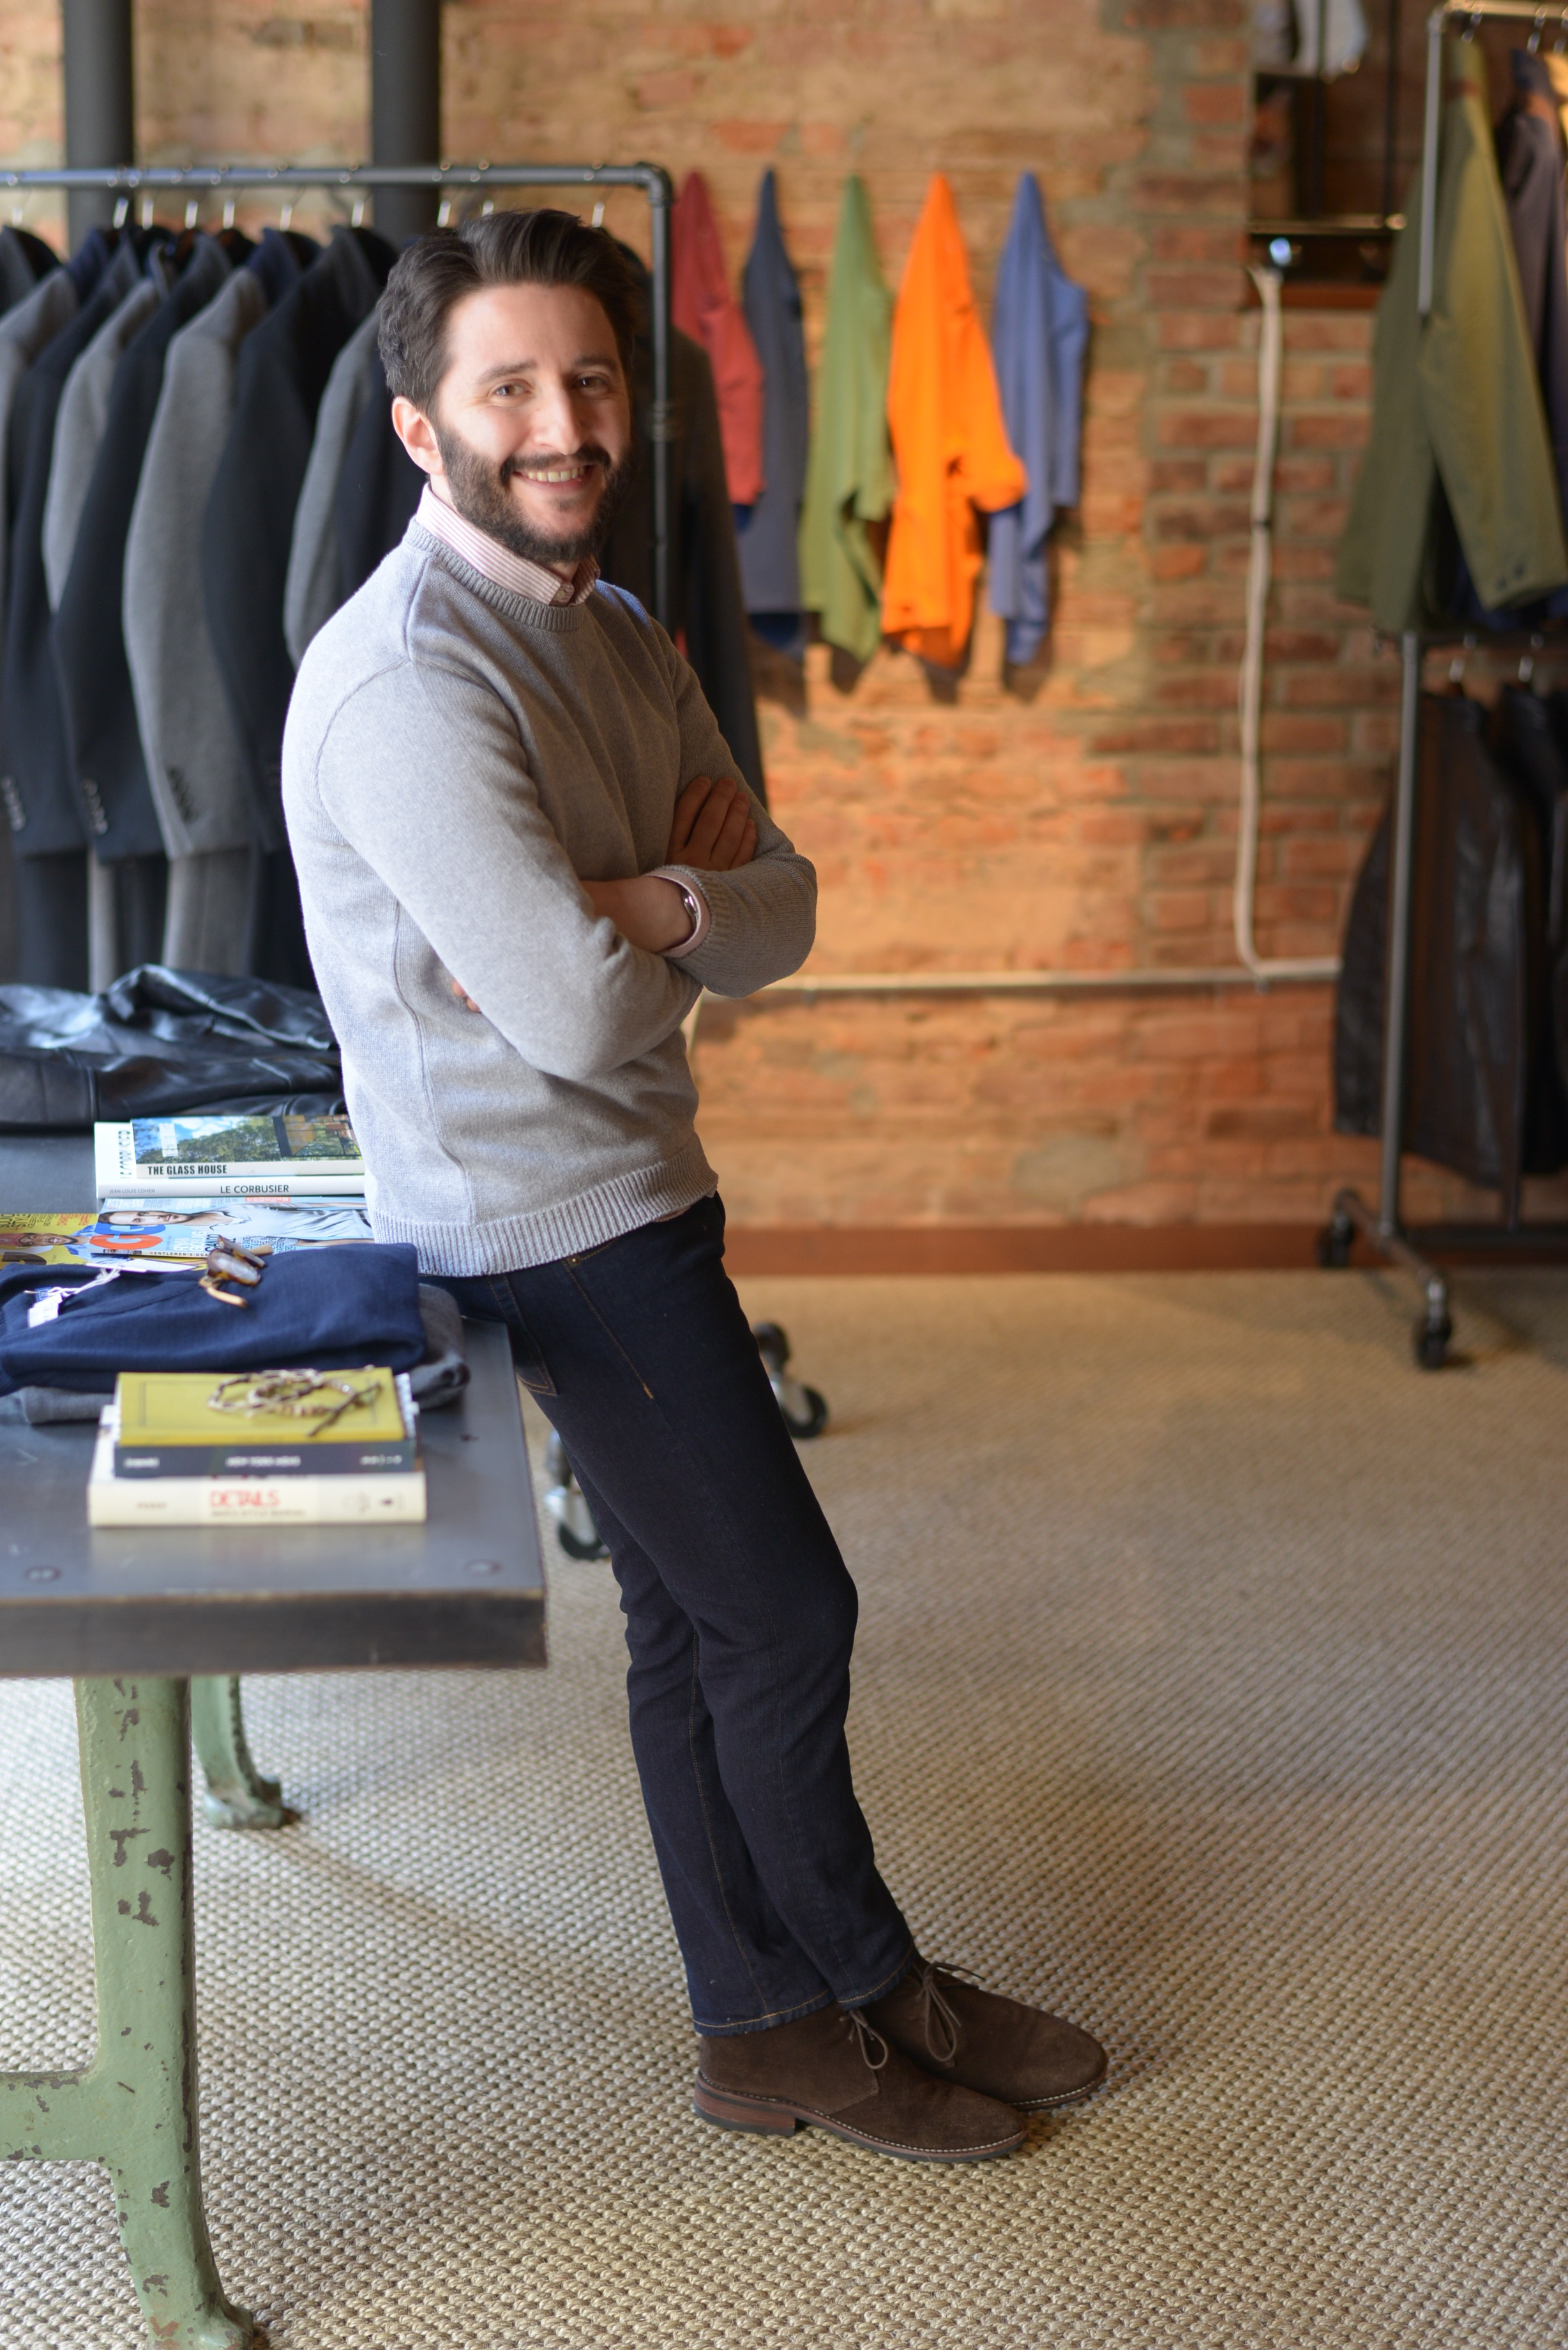 peter manning nyc, shorter men style